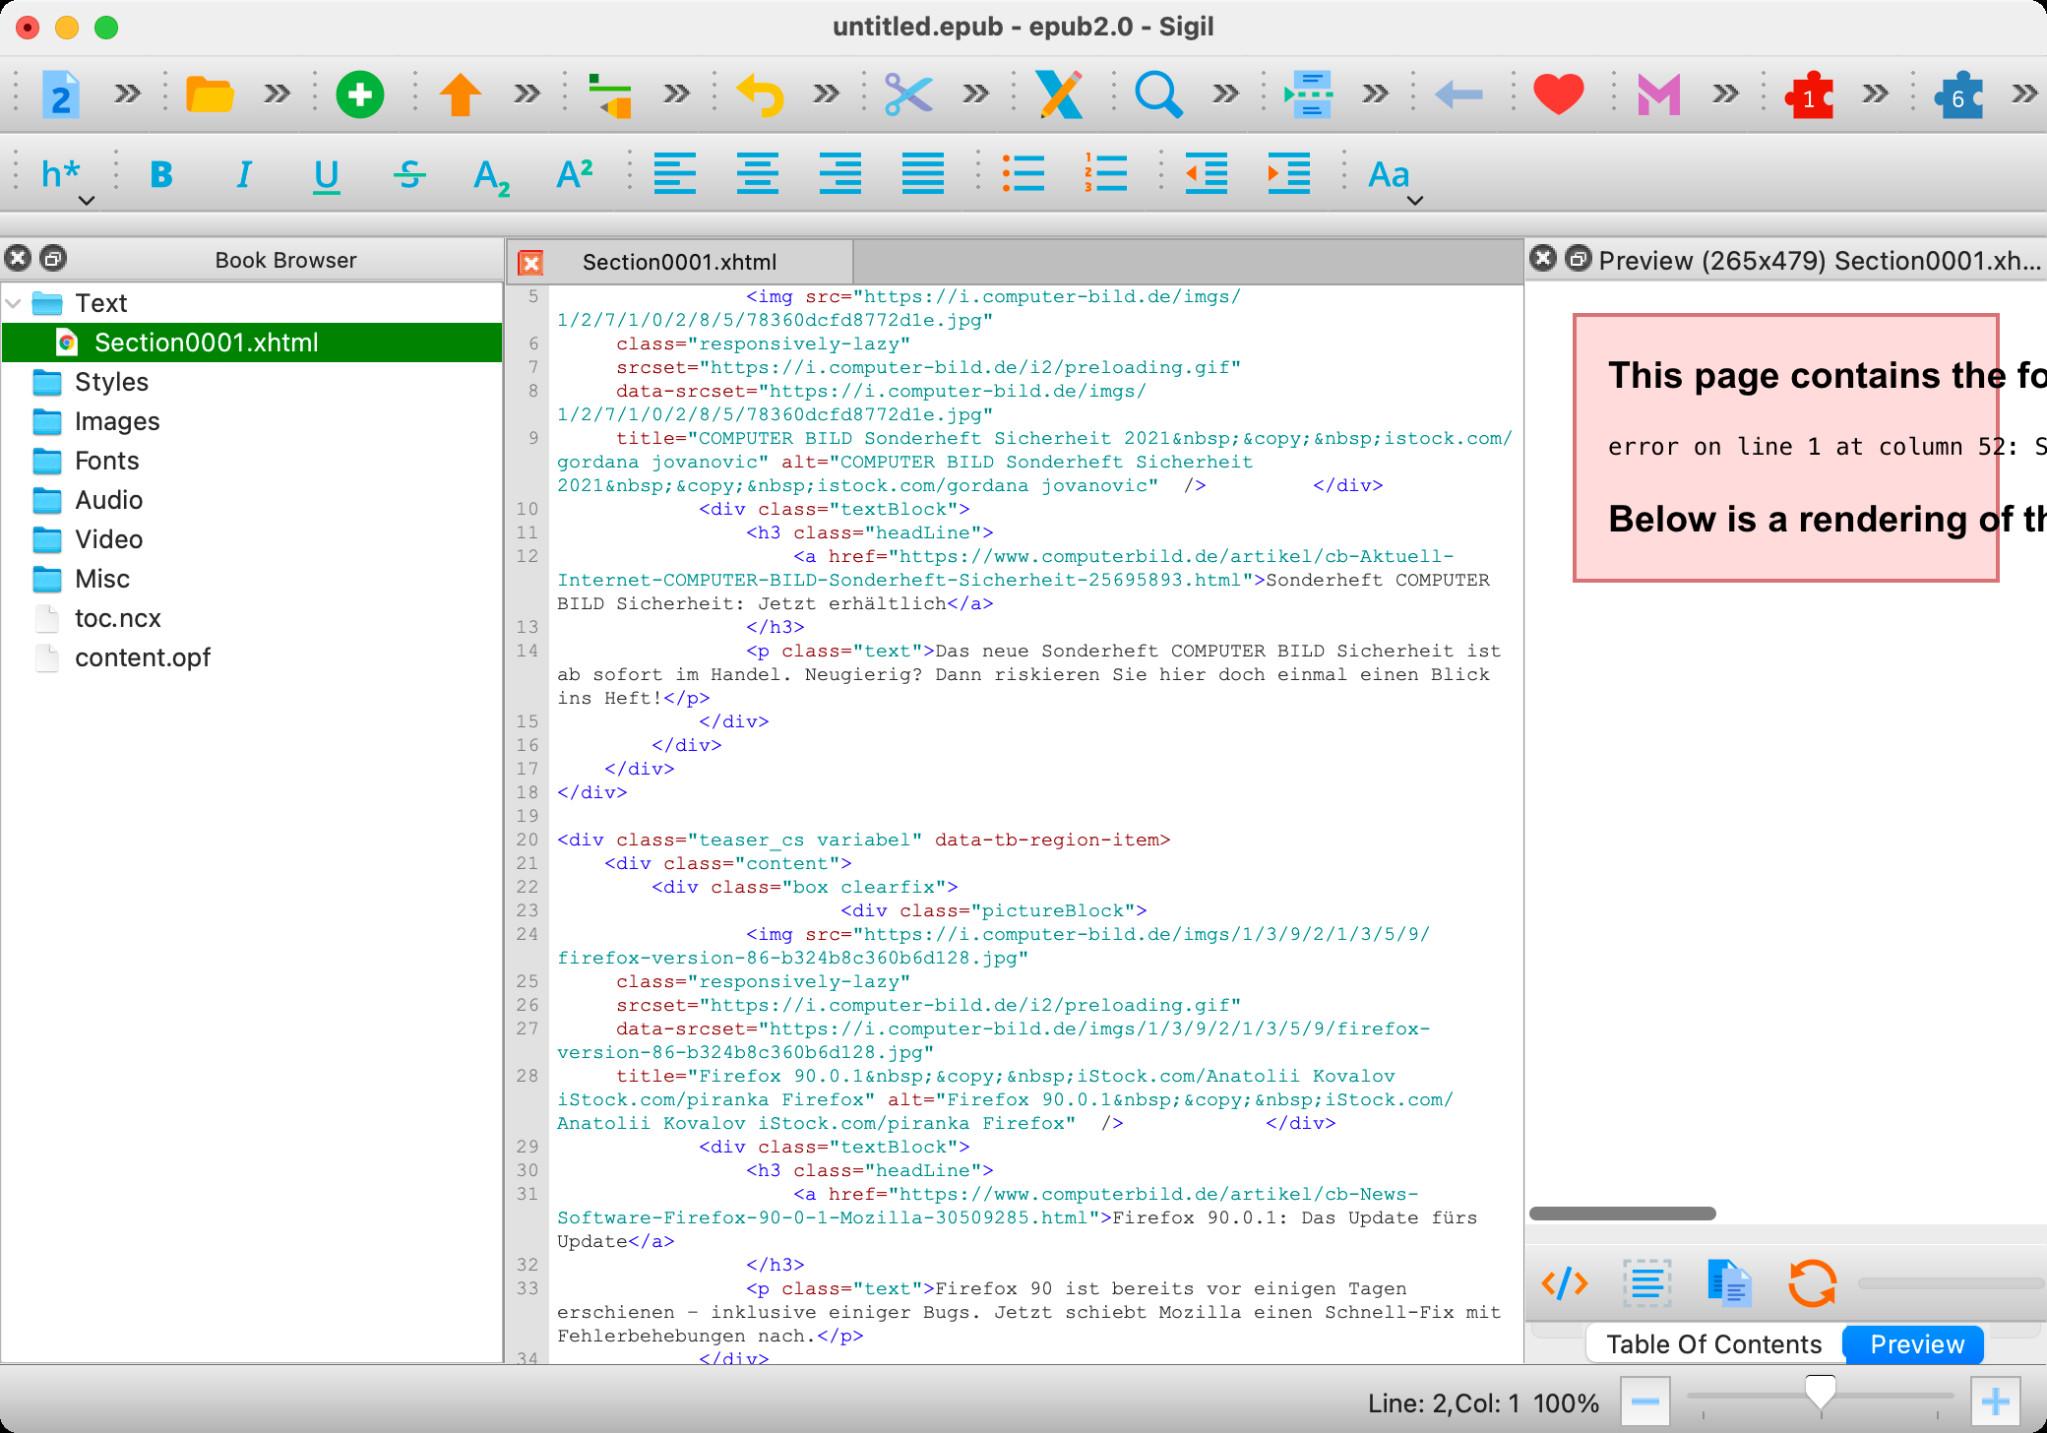 Screenshot 1 - Sigil (Mac)